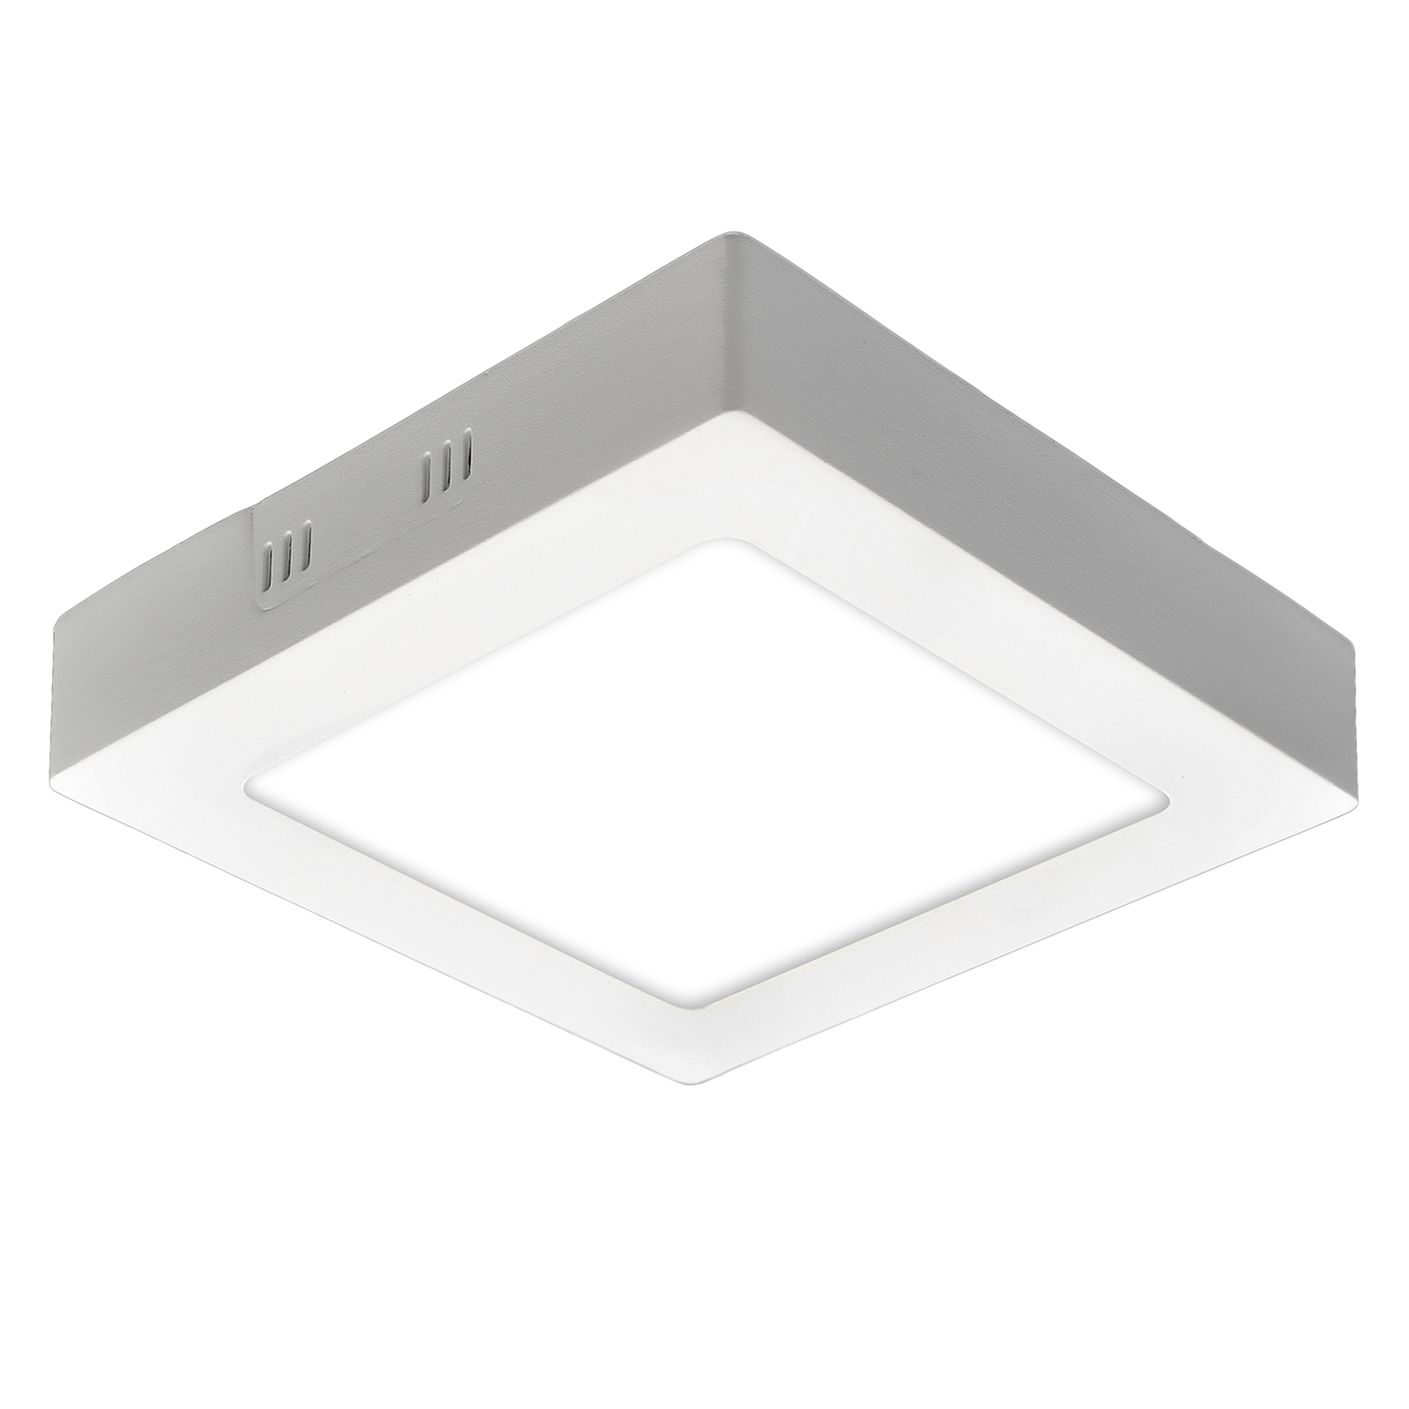 home24 LED-Deckenleuchte Dimplex IV